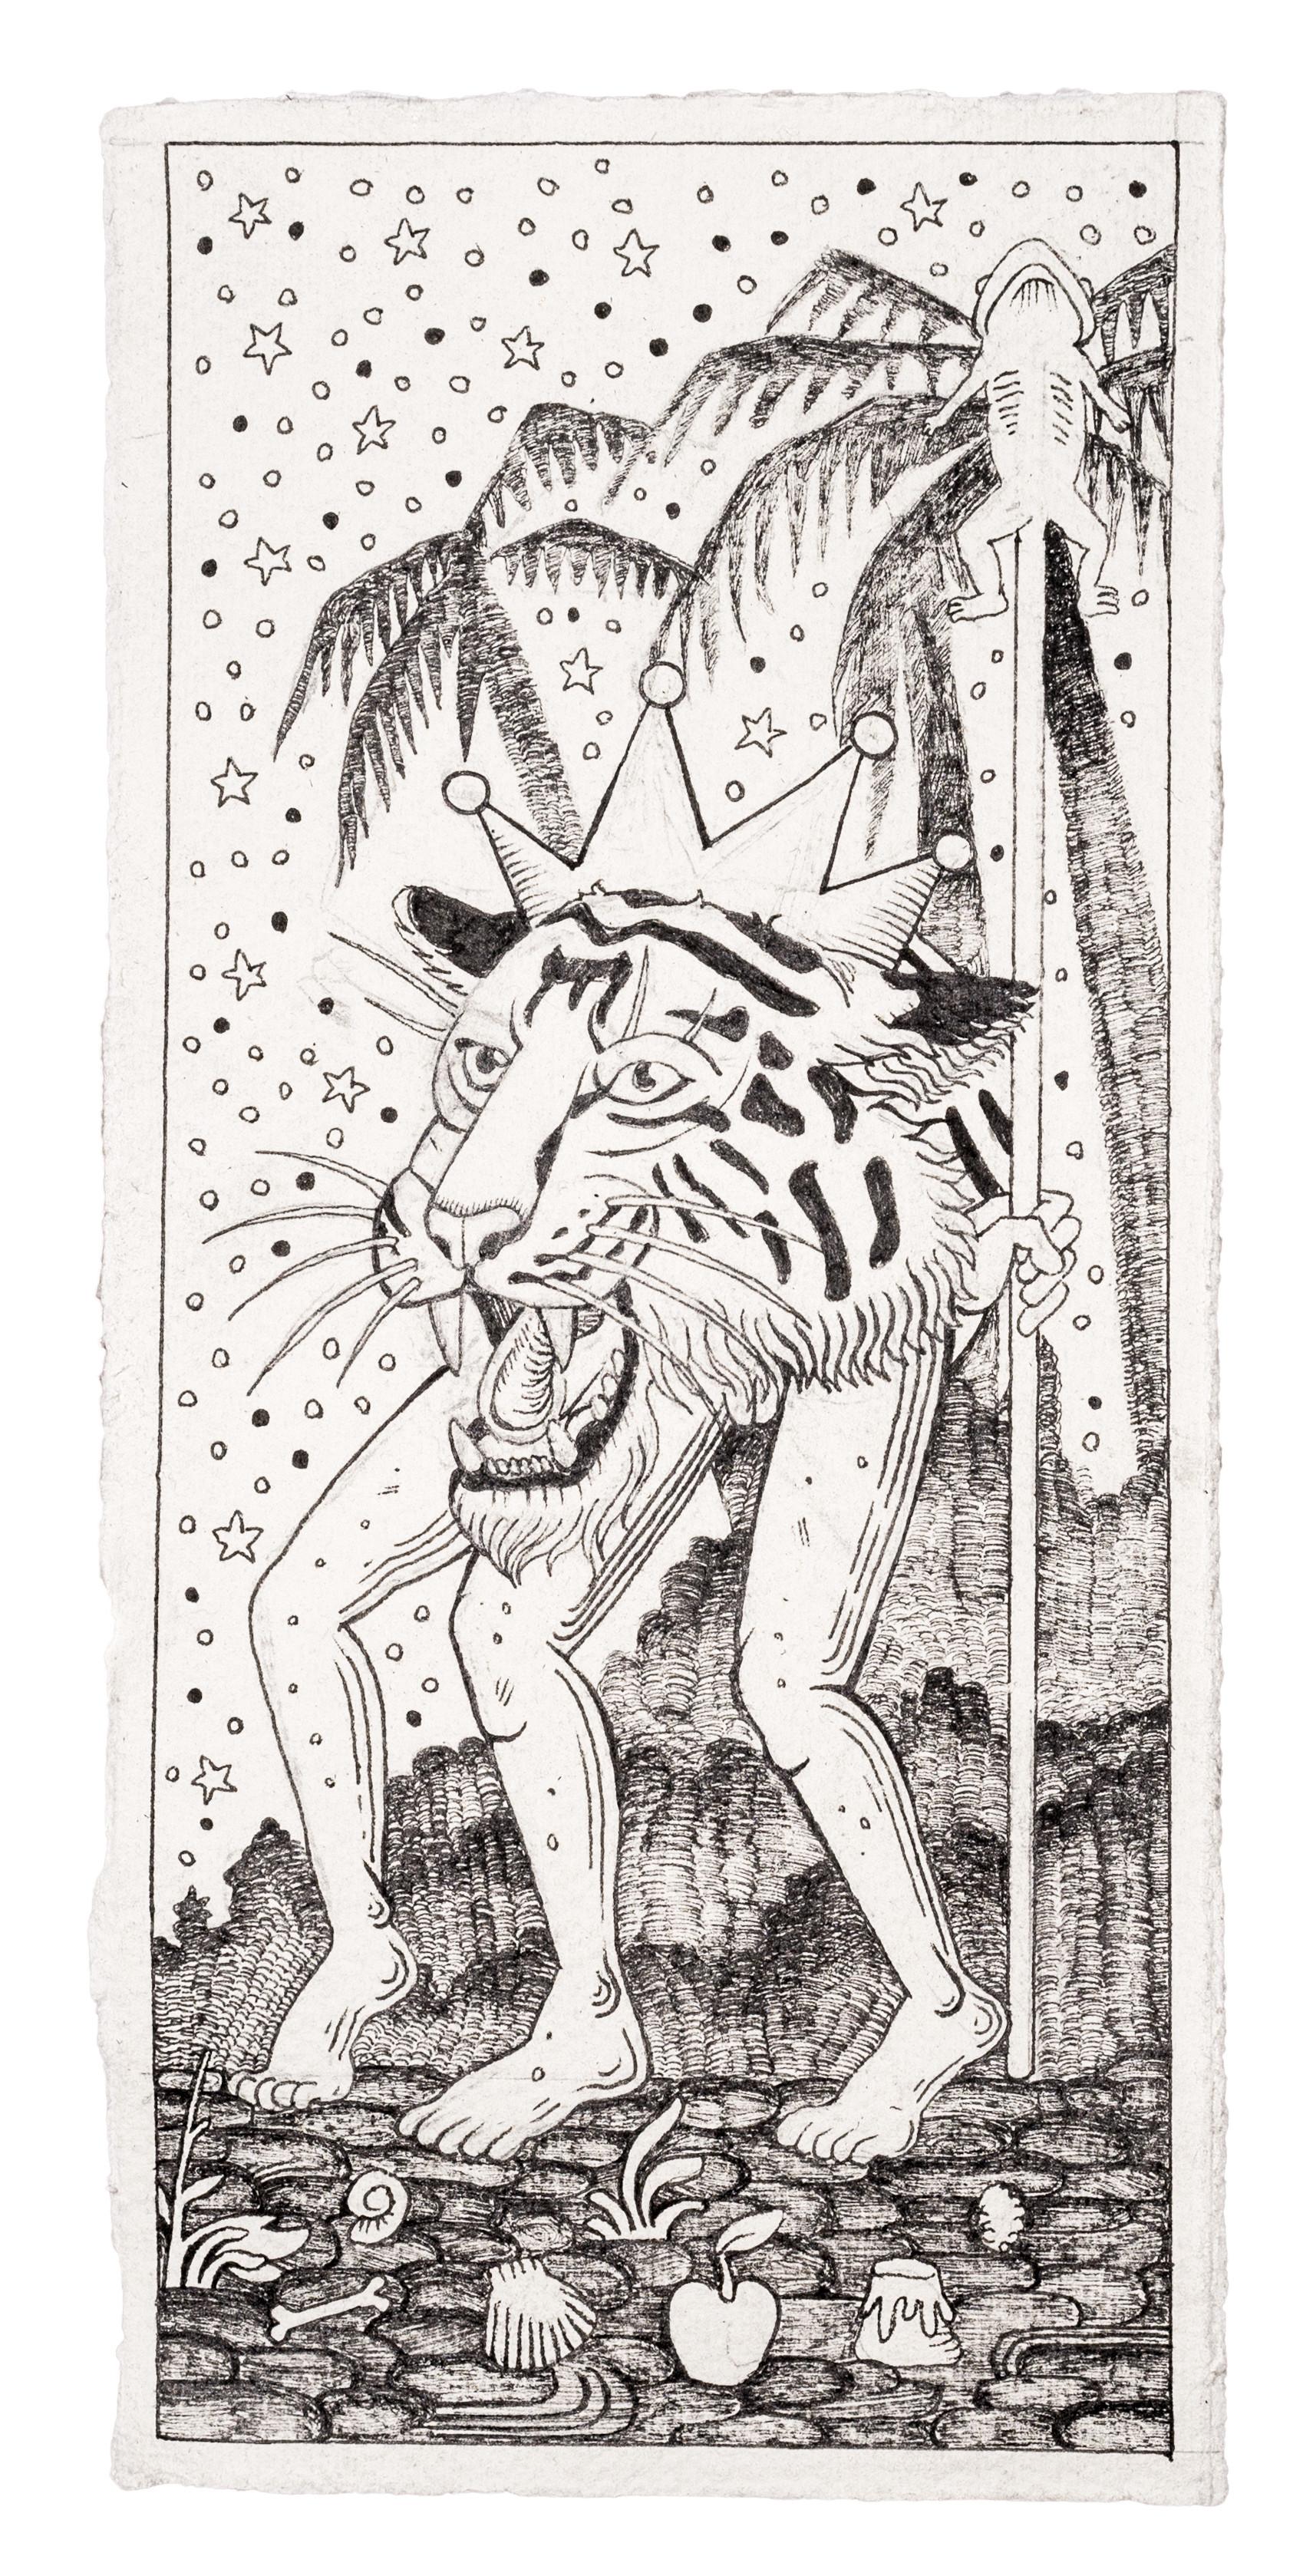 Agathe pitie agathe pitie le tigre13cm26cm 2016